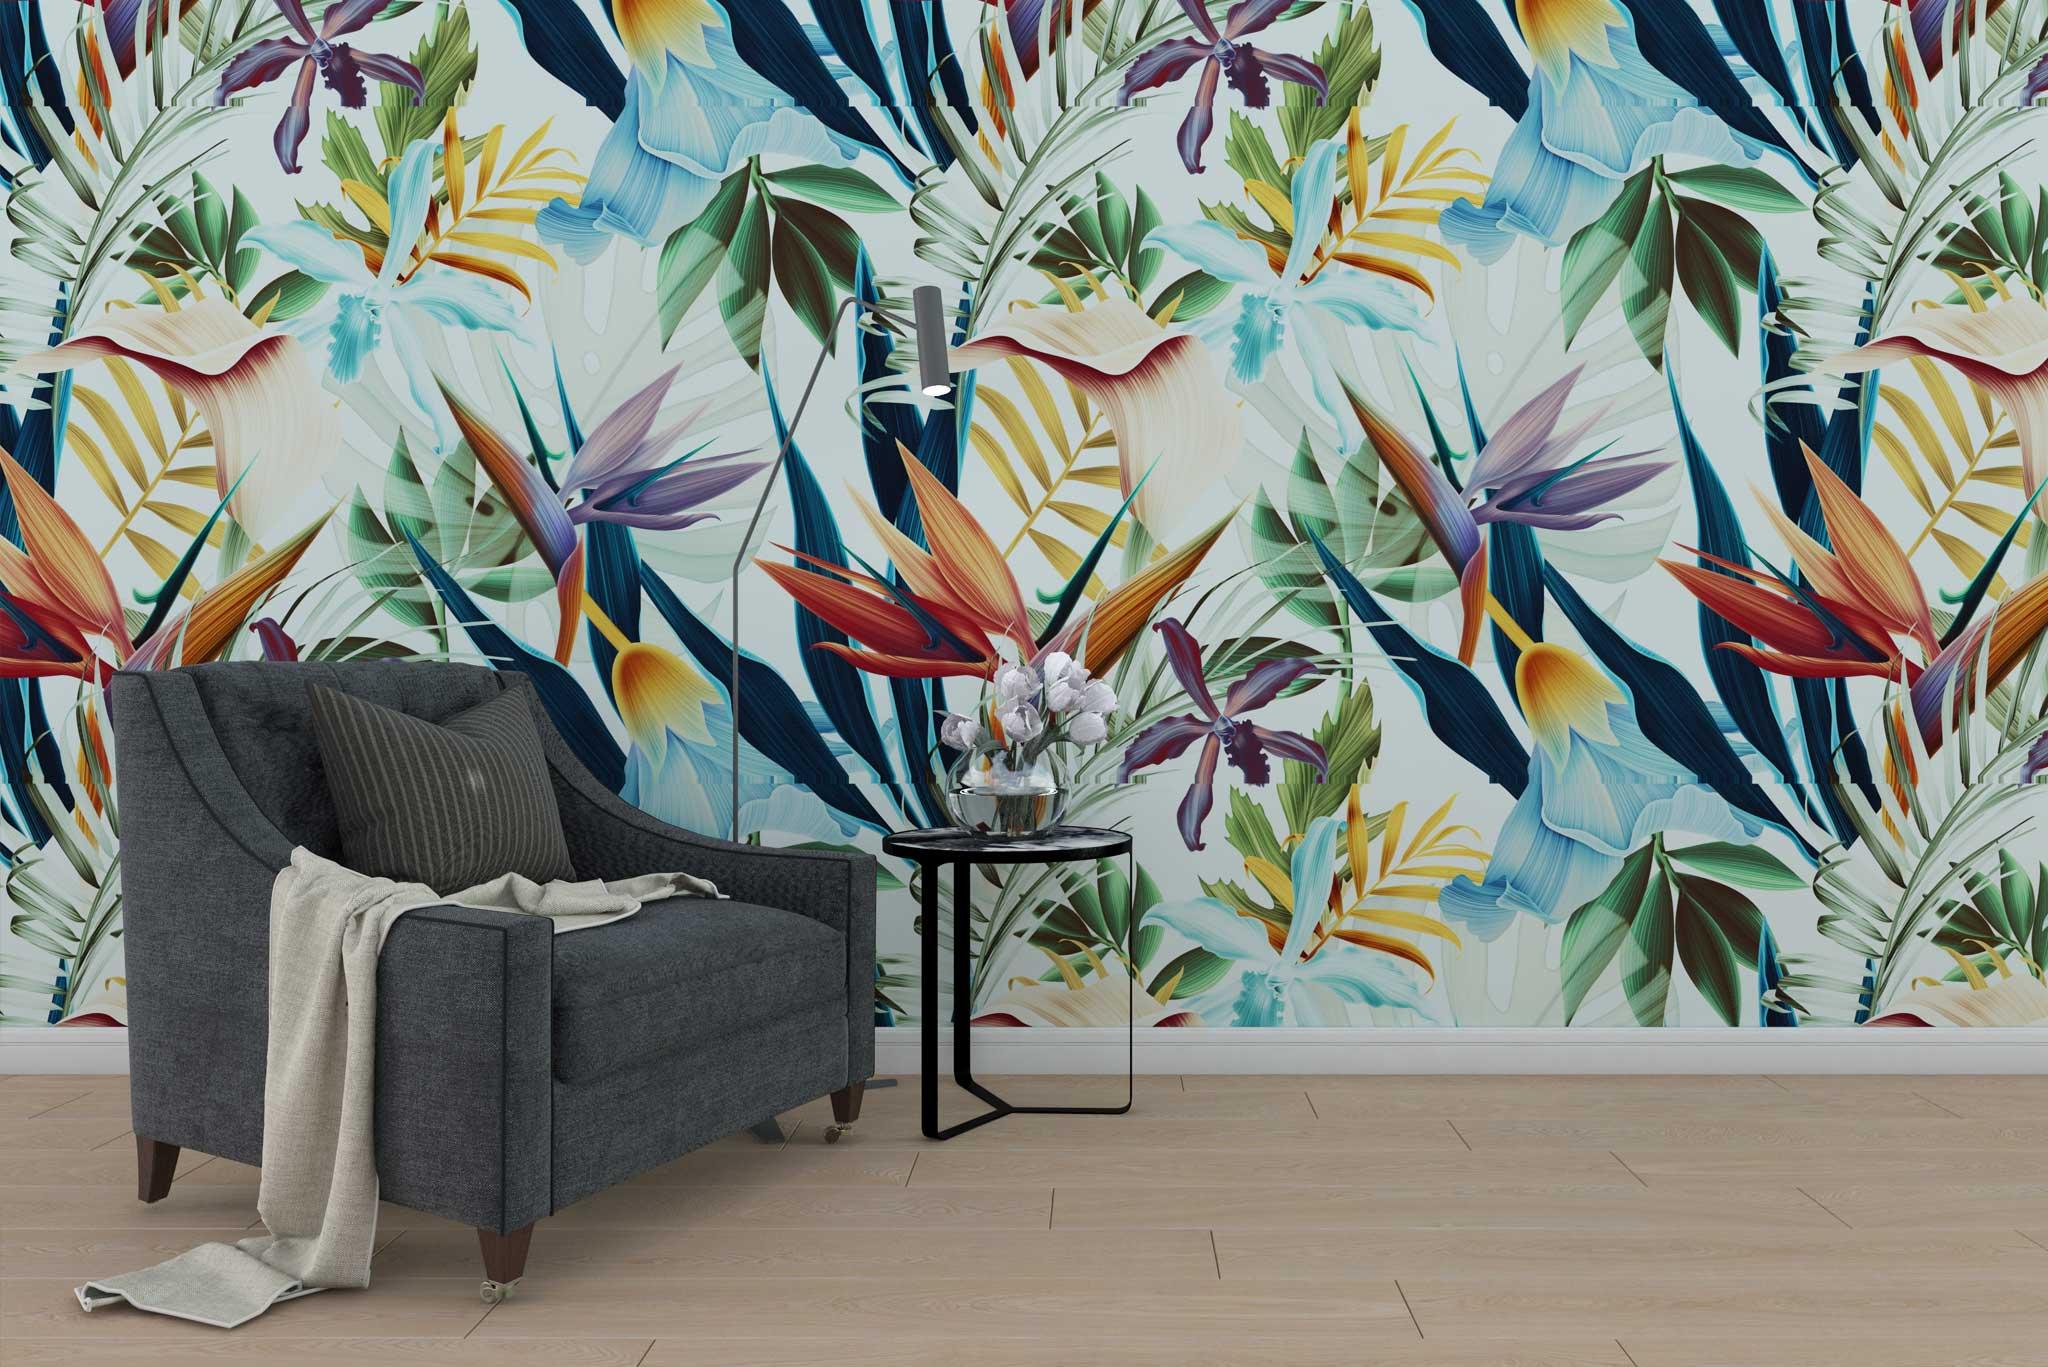 tapet-fototapet-design-personalizat-comanda-customizabil-bucuresti-daring-prints-flori-model-motiv-vegetal-frunze-exotic-multicolor-colorat